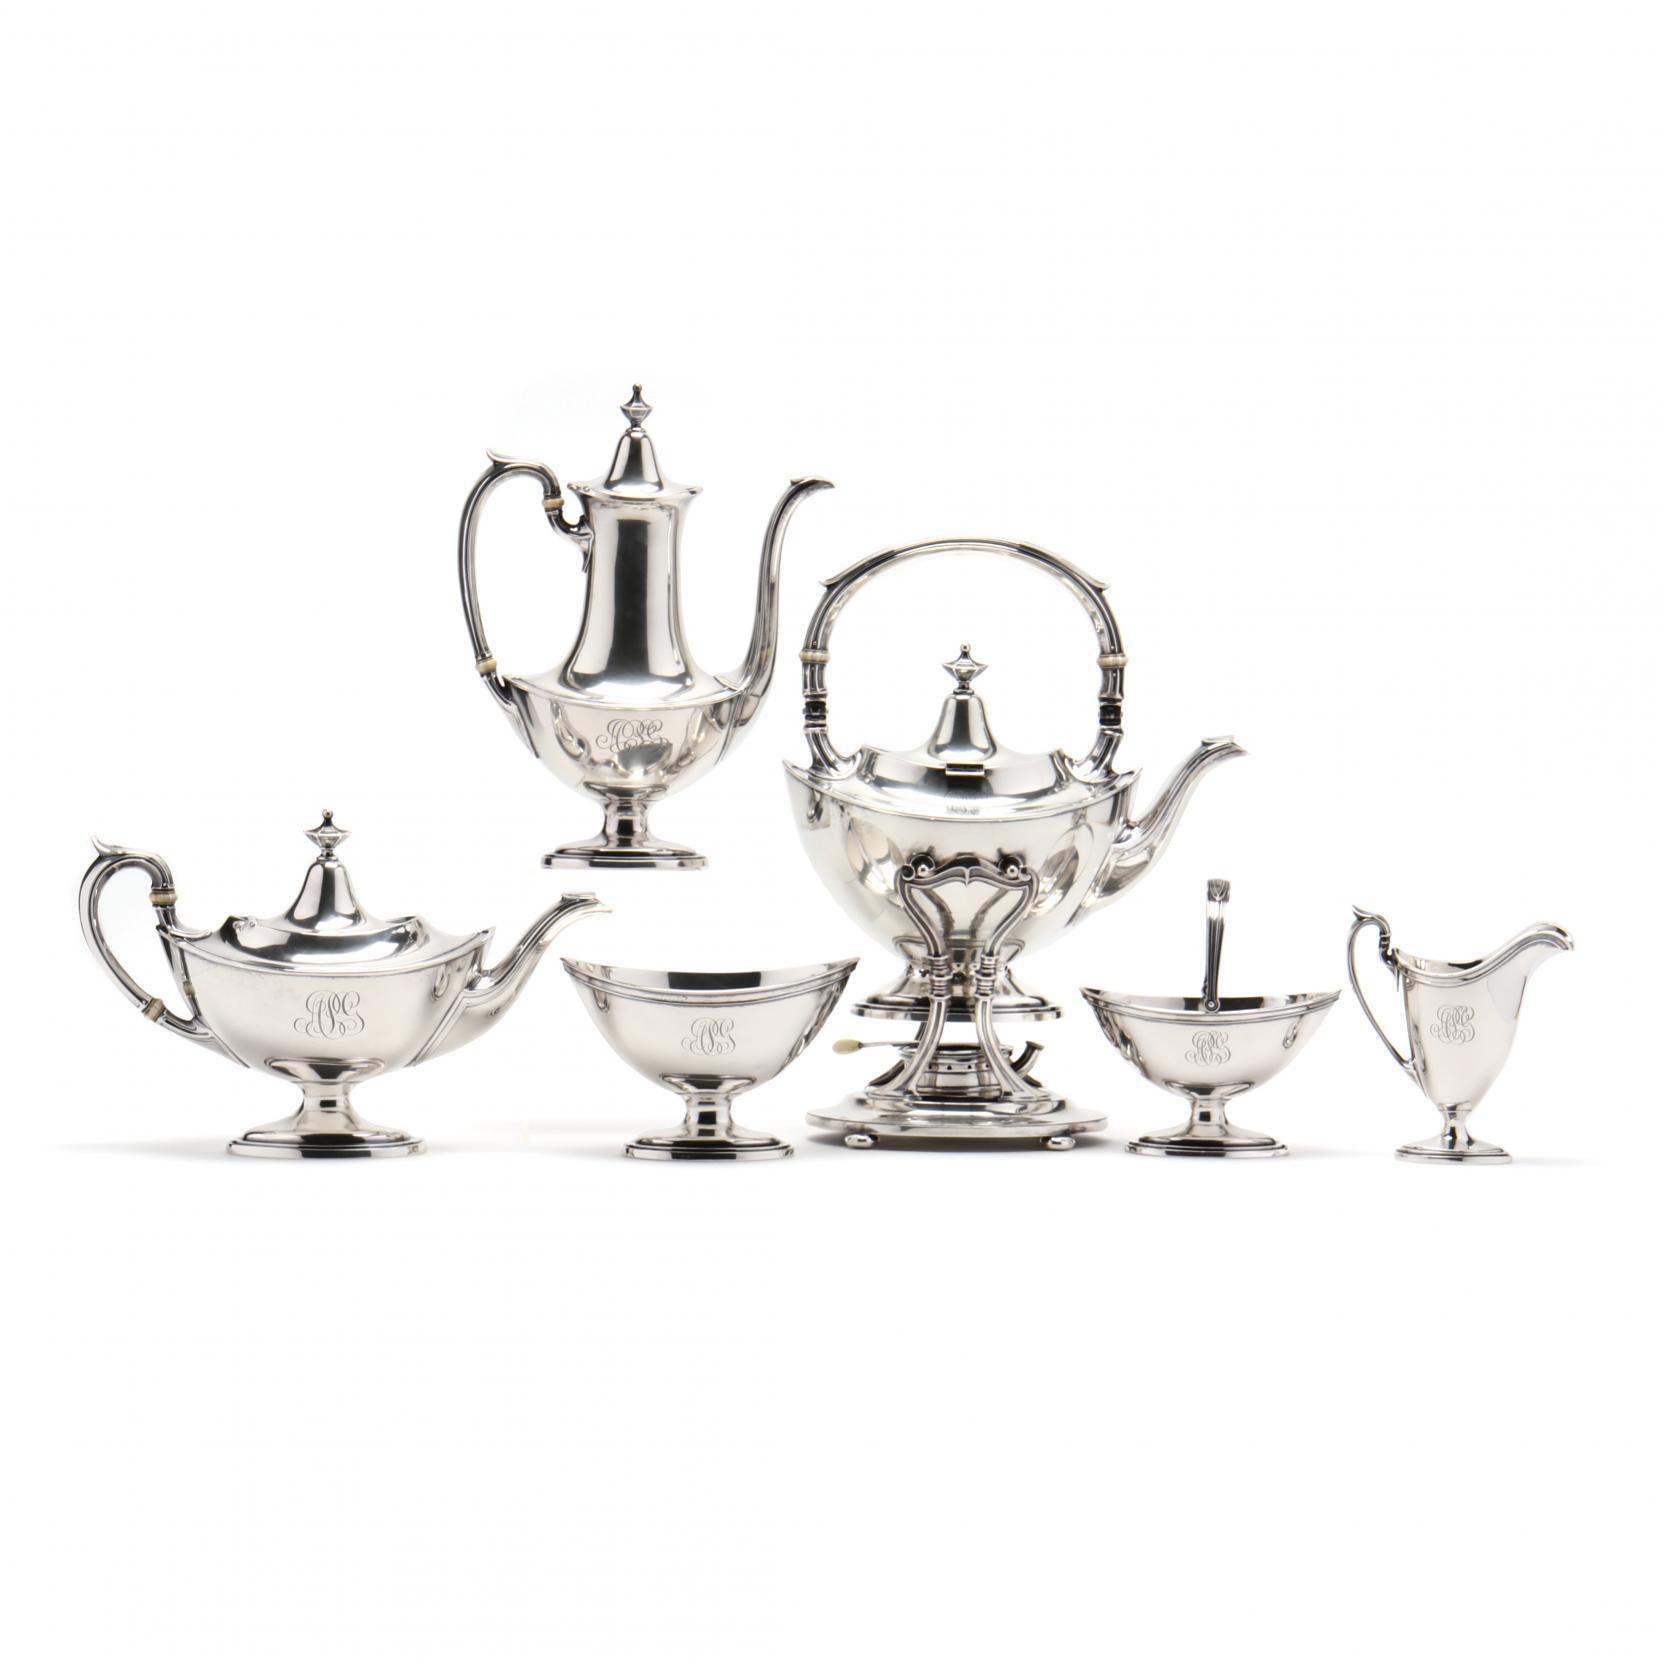 gorham-portsmouth-sterling-silver-tea-demitasse-service